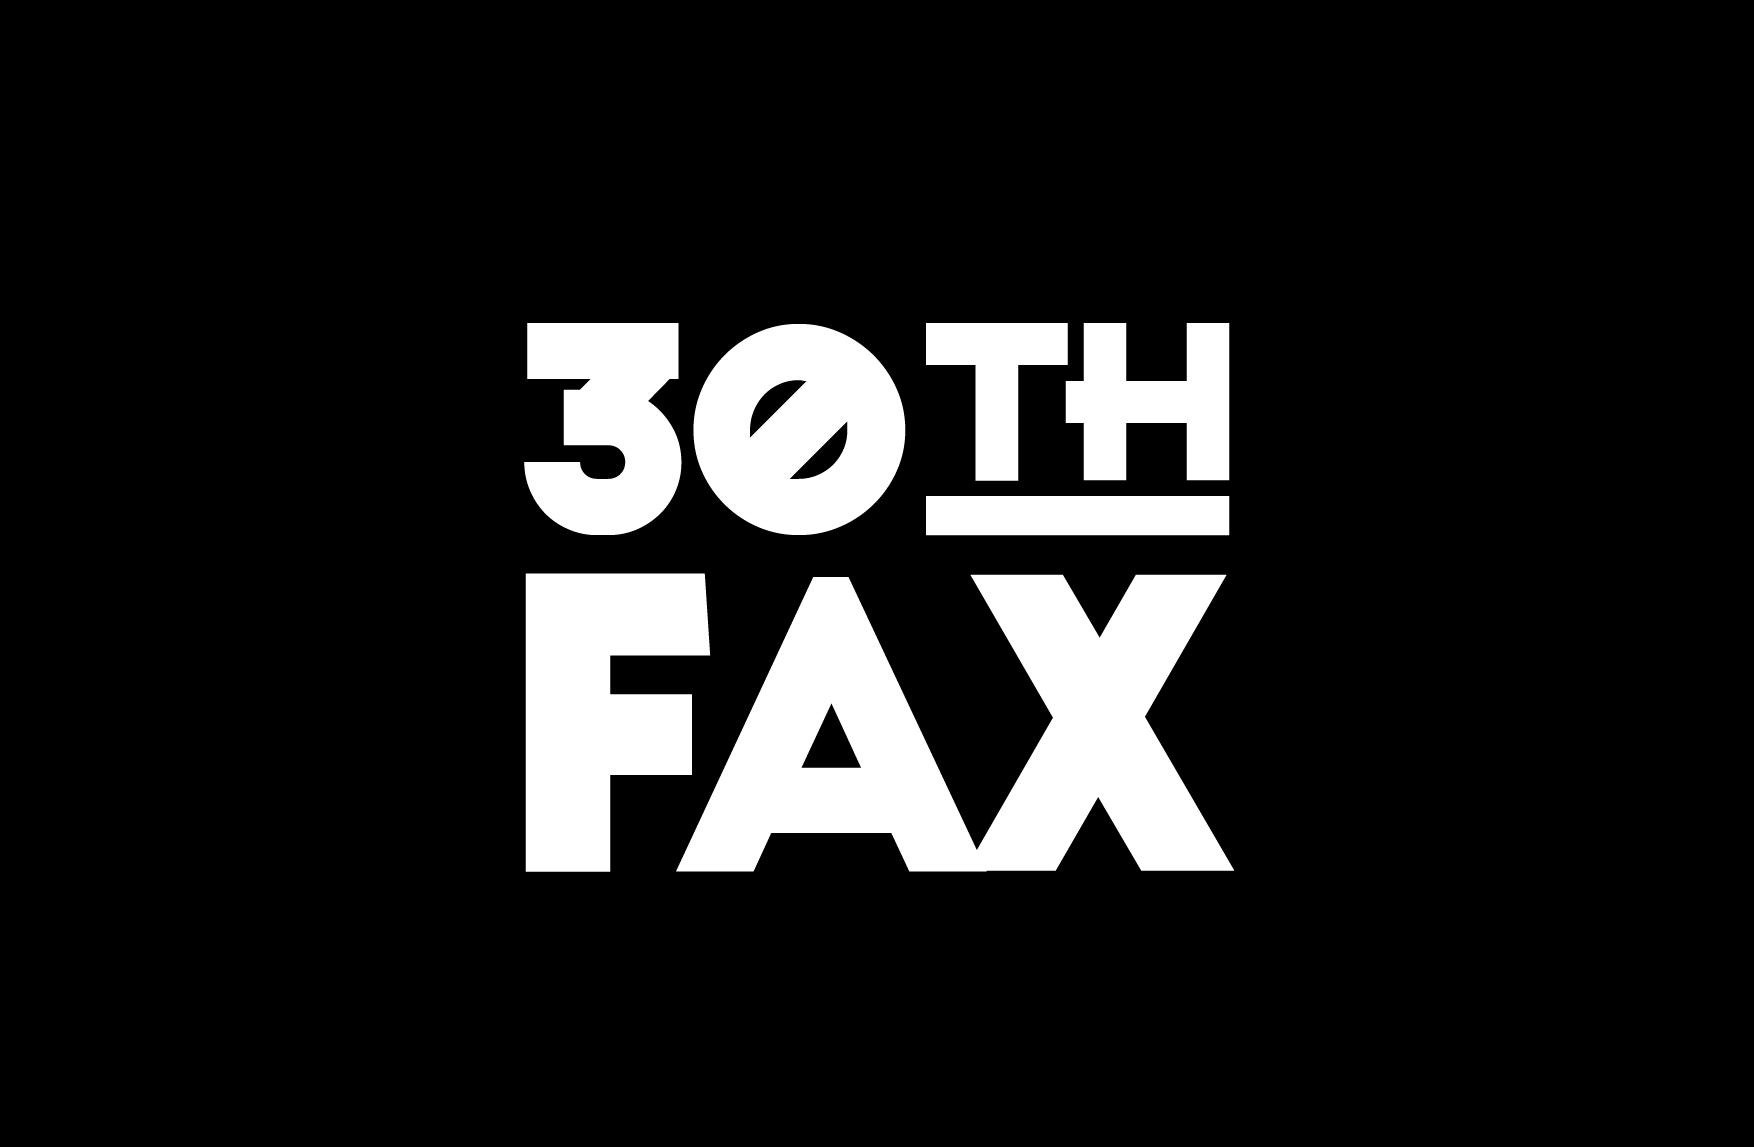 30thfax.png